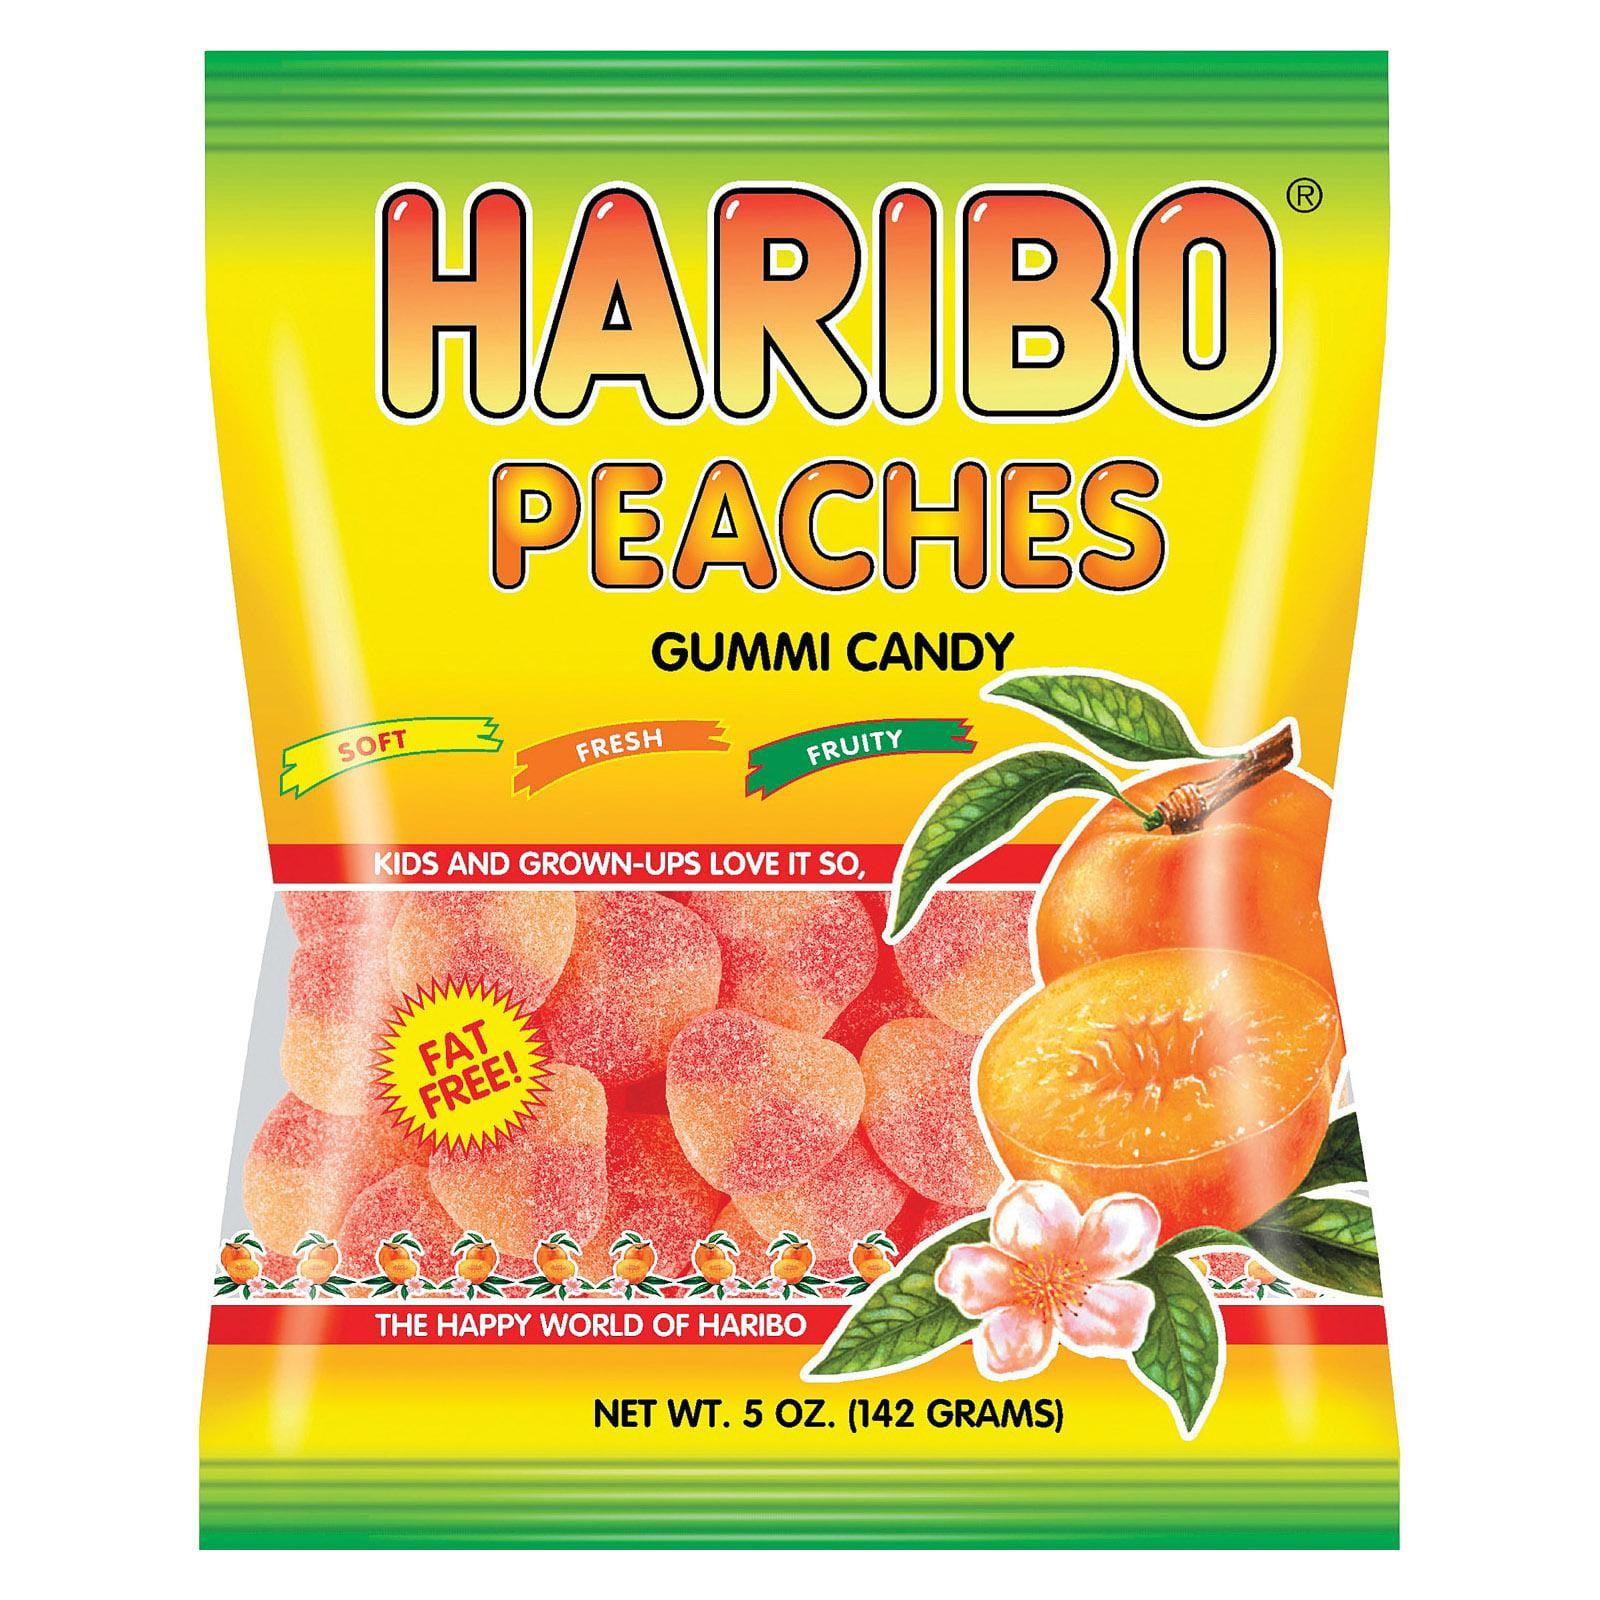 Haribo Peaches - Natural - pack of 12 - 5 Oz.